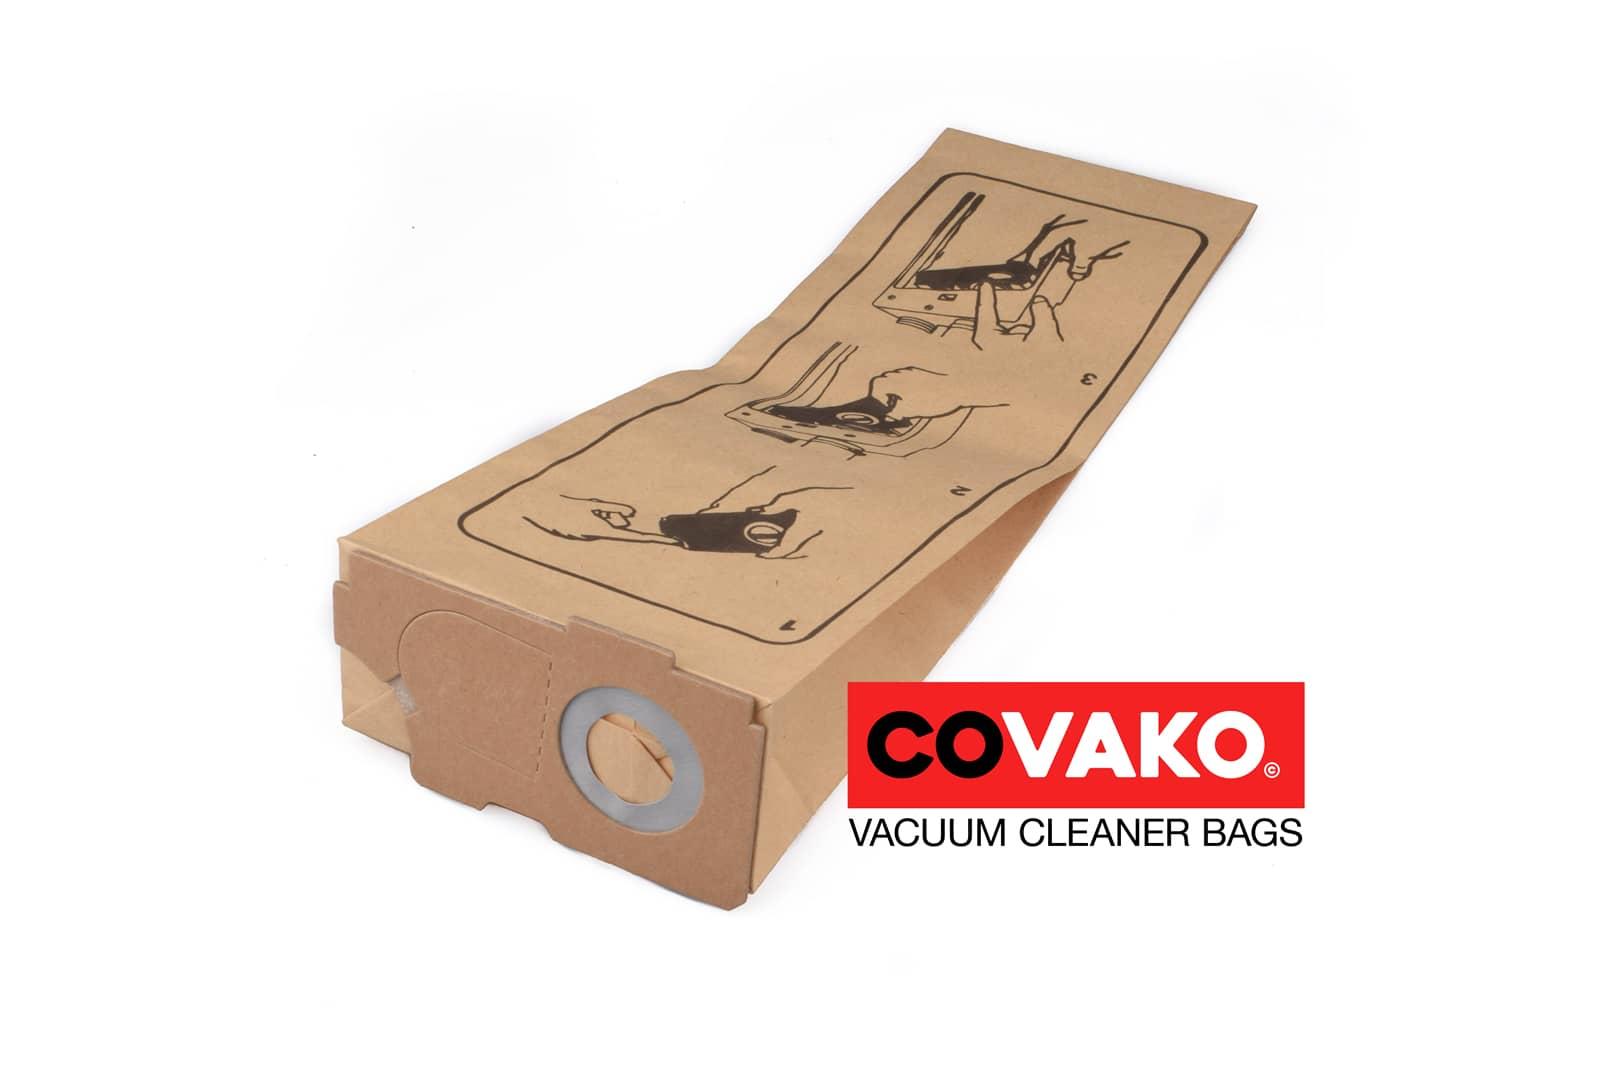 Sebo Evolution 300 / Papier - Sebo sacs d'aspirateur